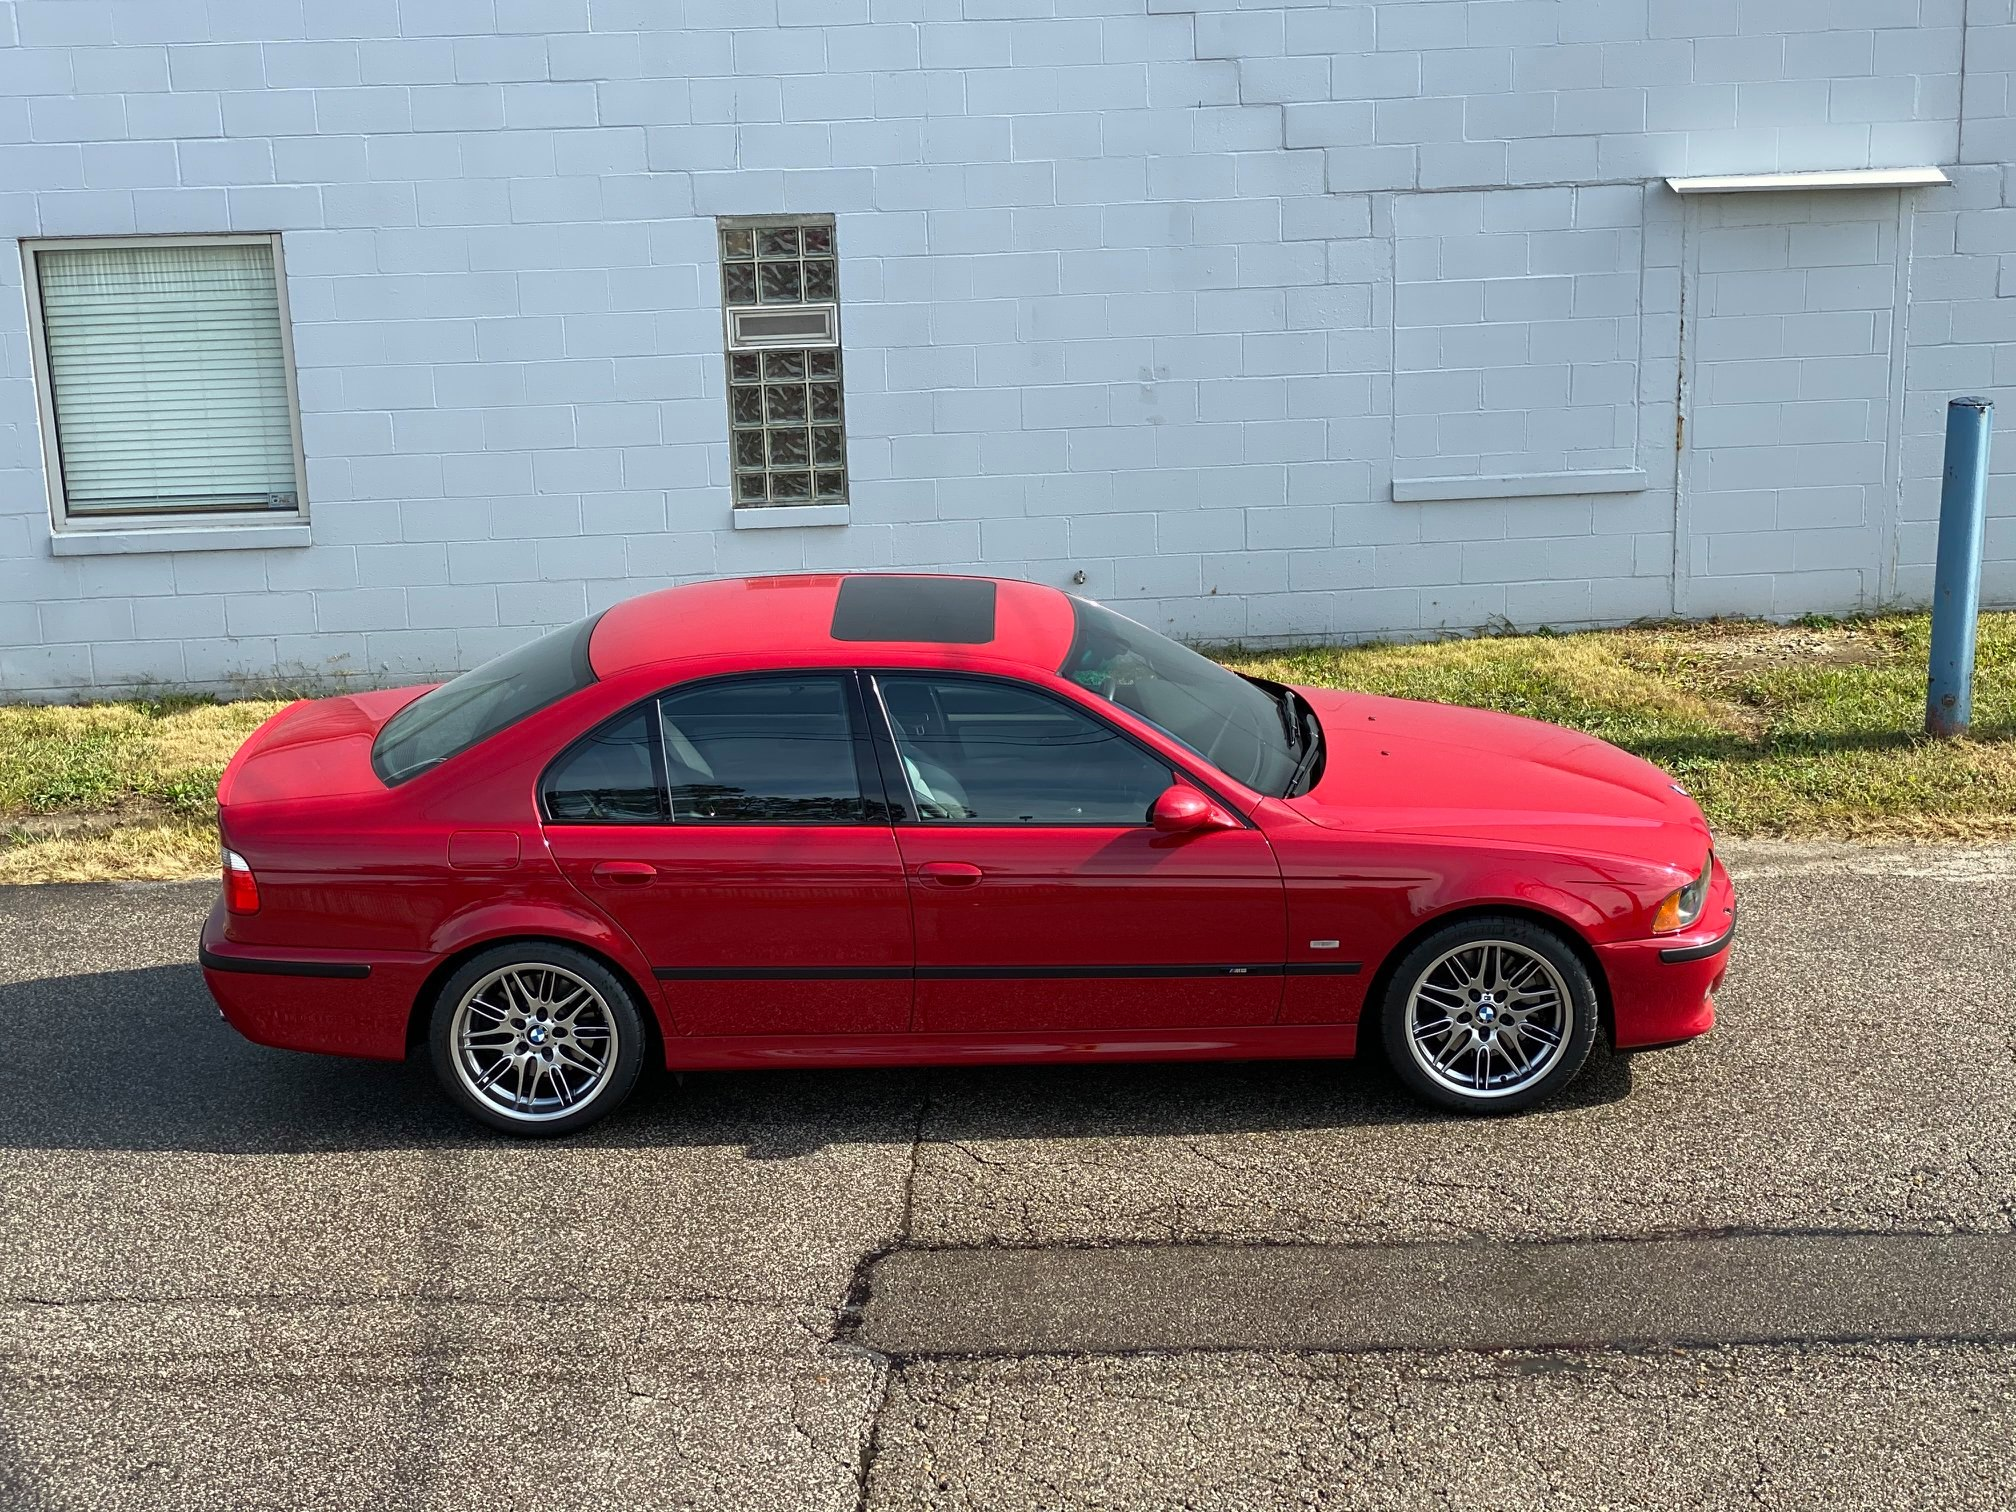 BMW_M5_E39_Imola_Red_0017